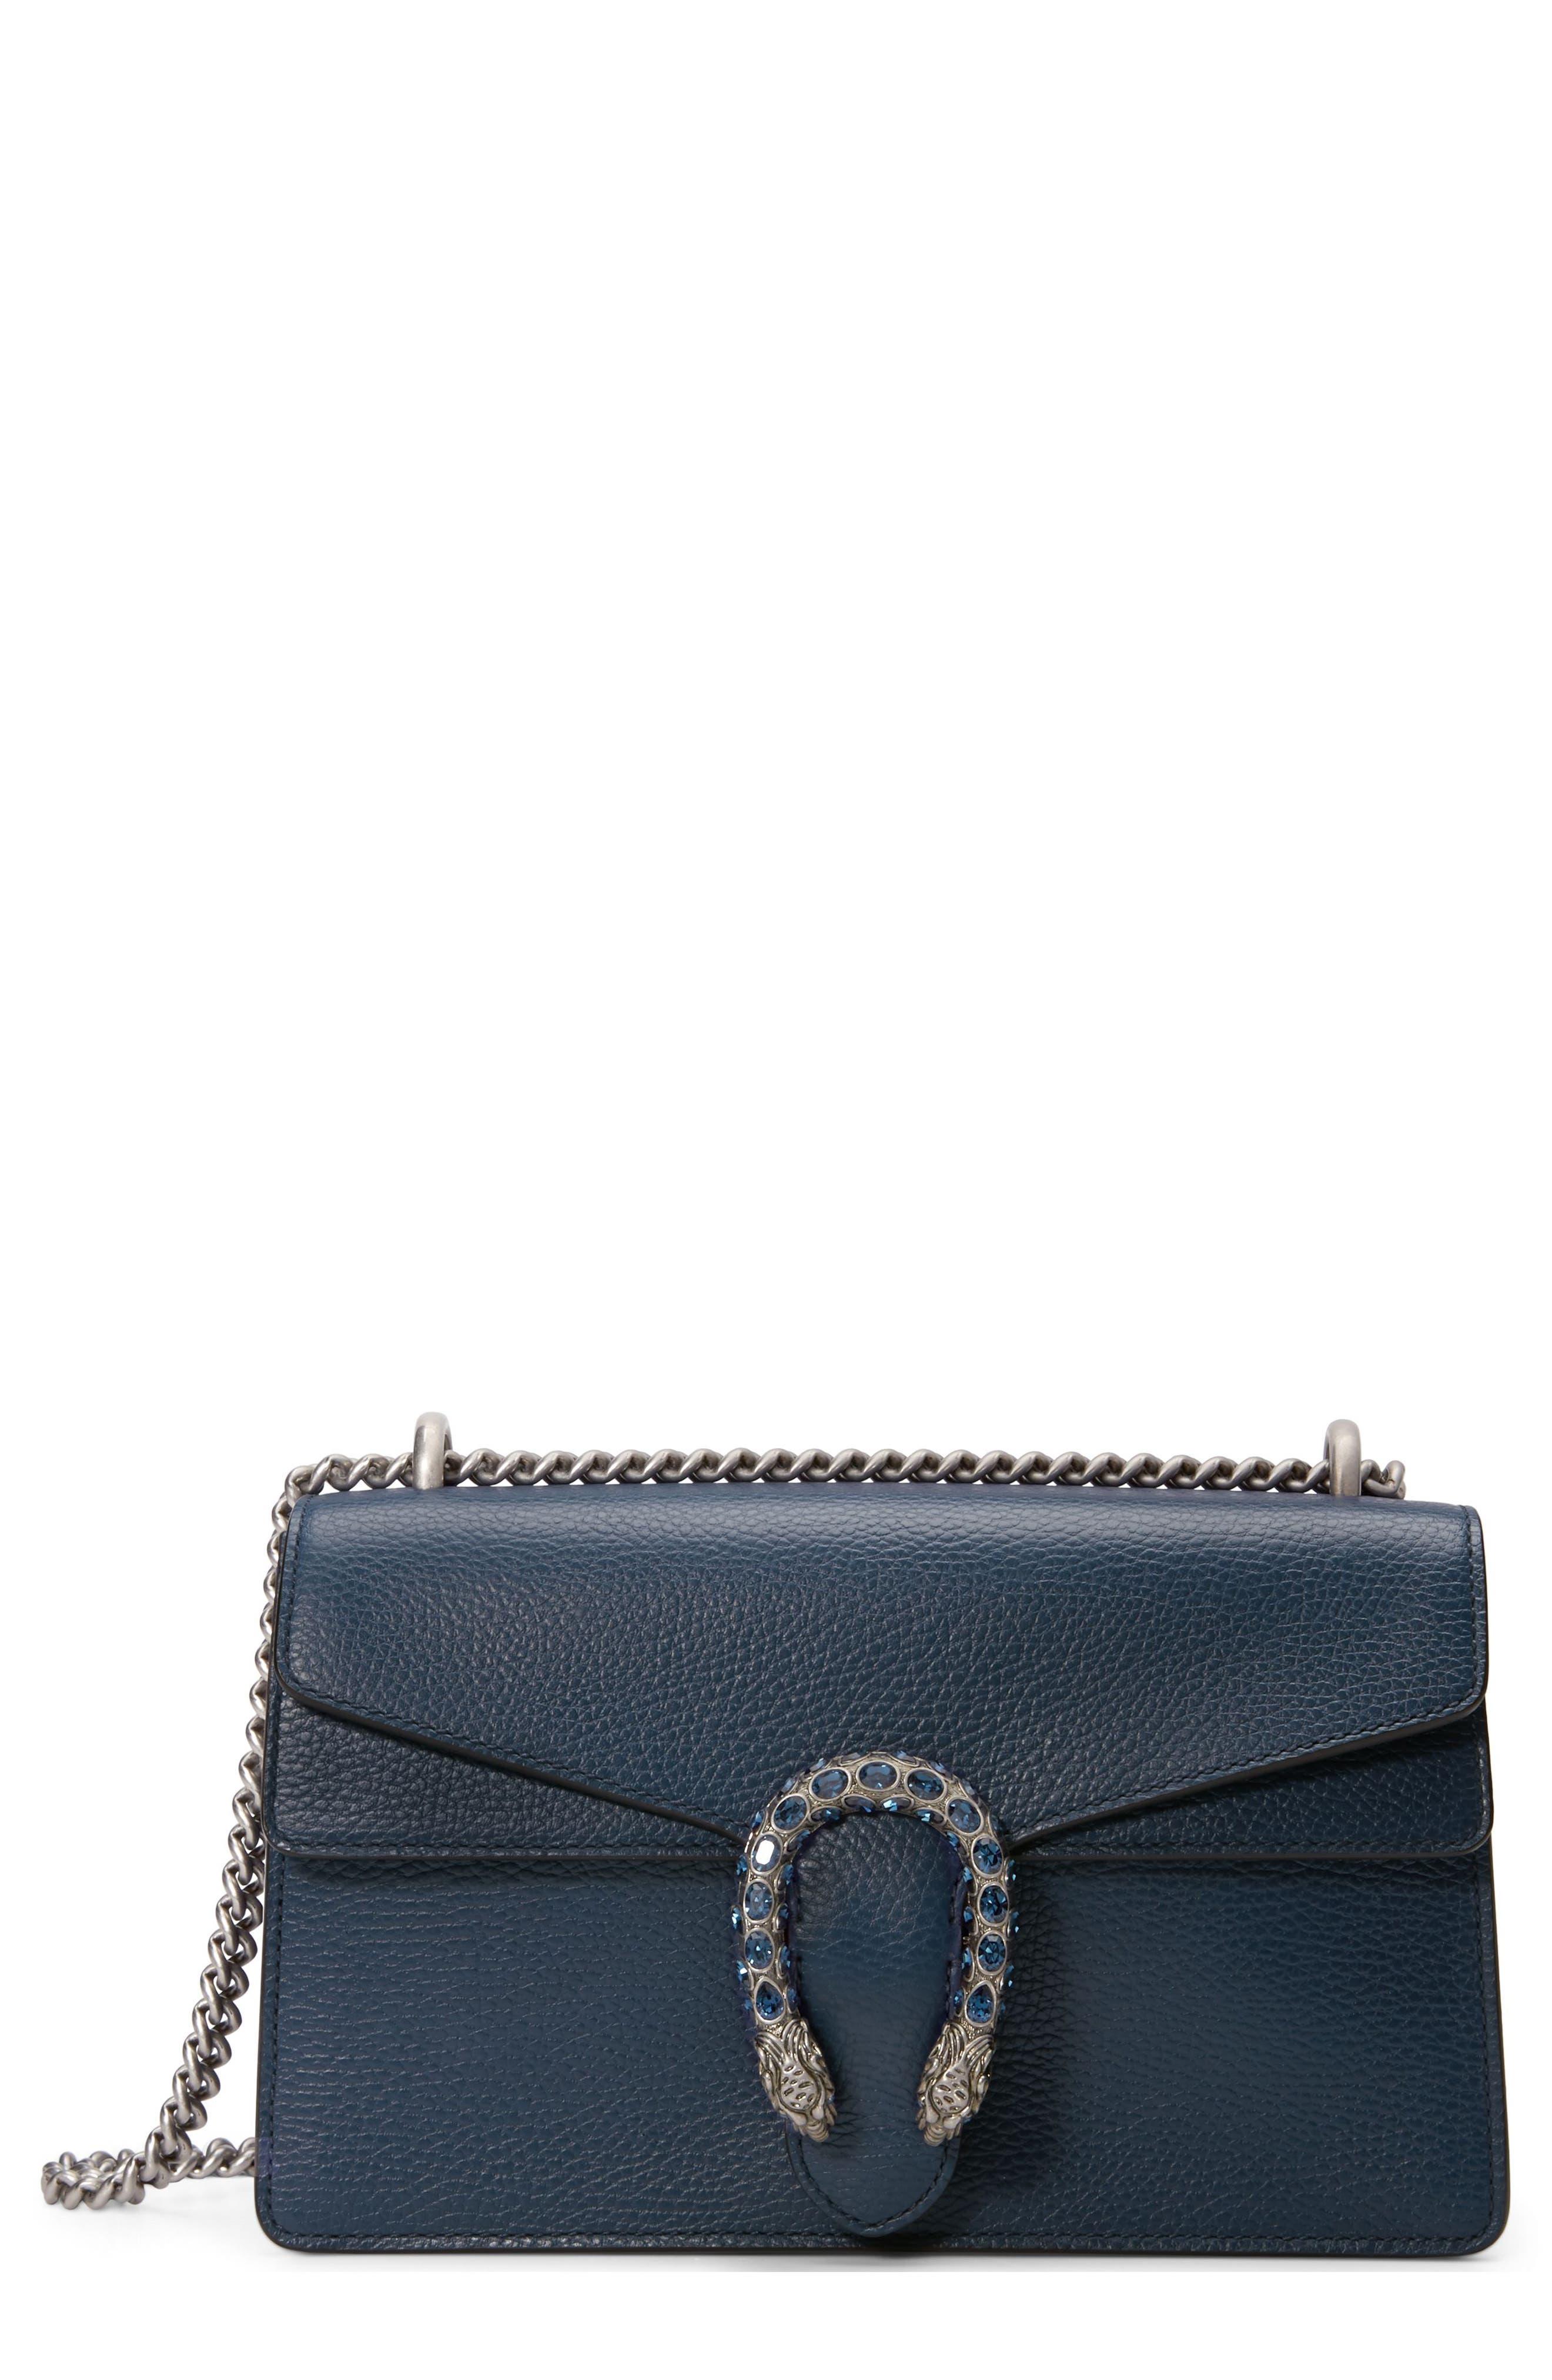 Small Dionysus Leather Shoulder Bag,                         Main,                         color, BLU AGATA/ MONTANA